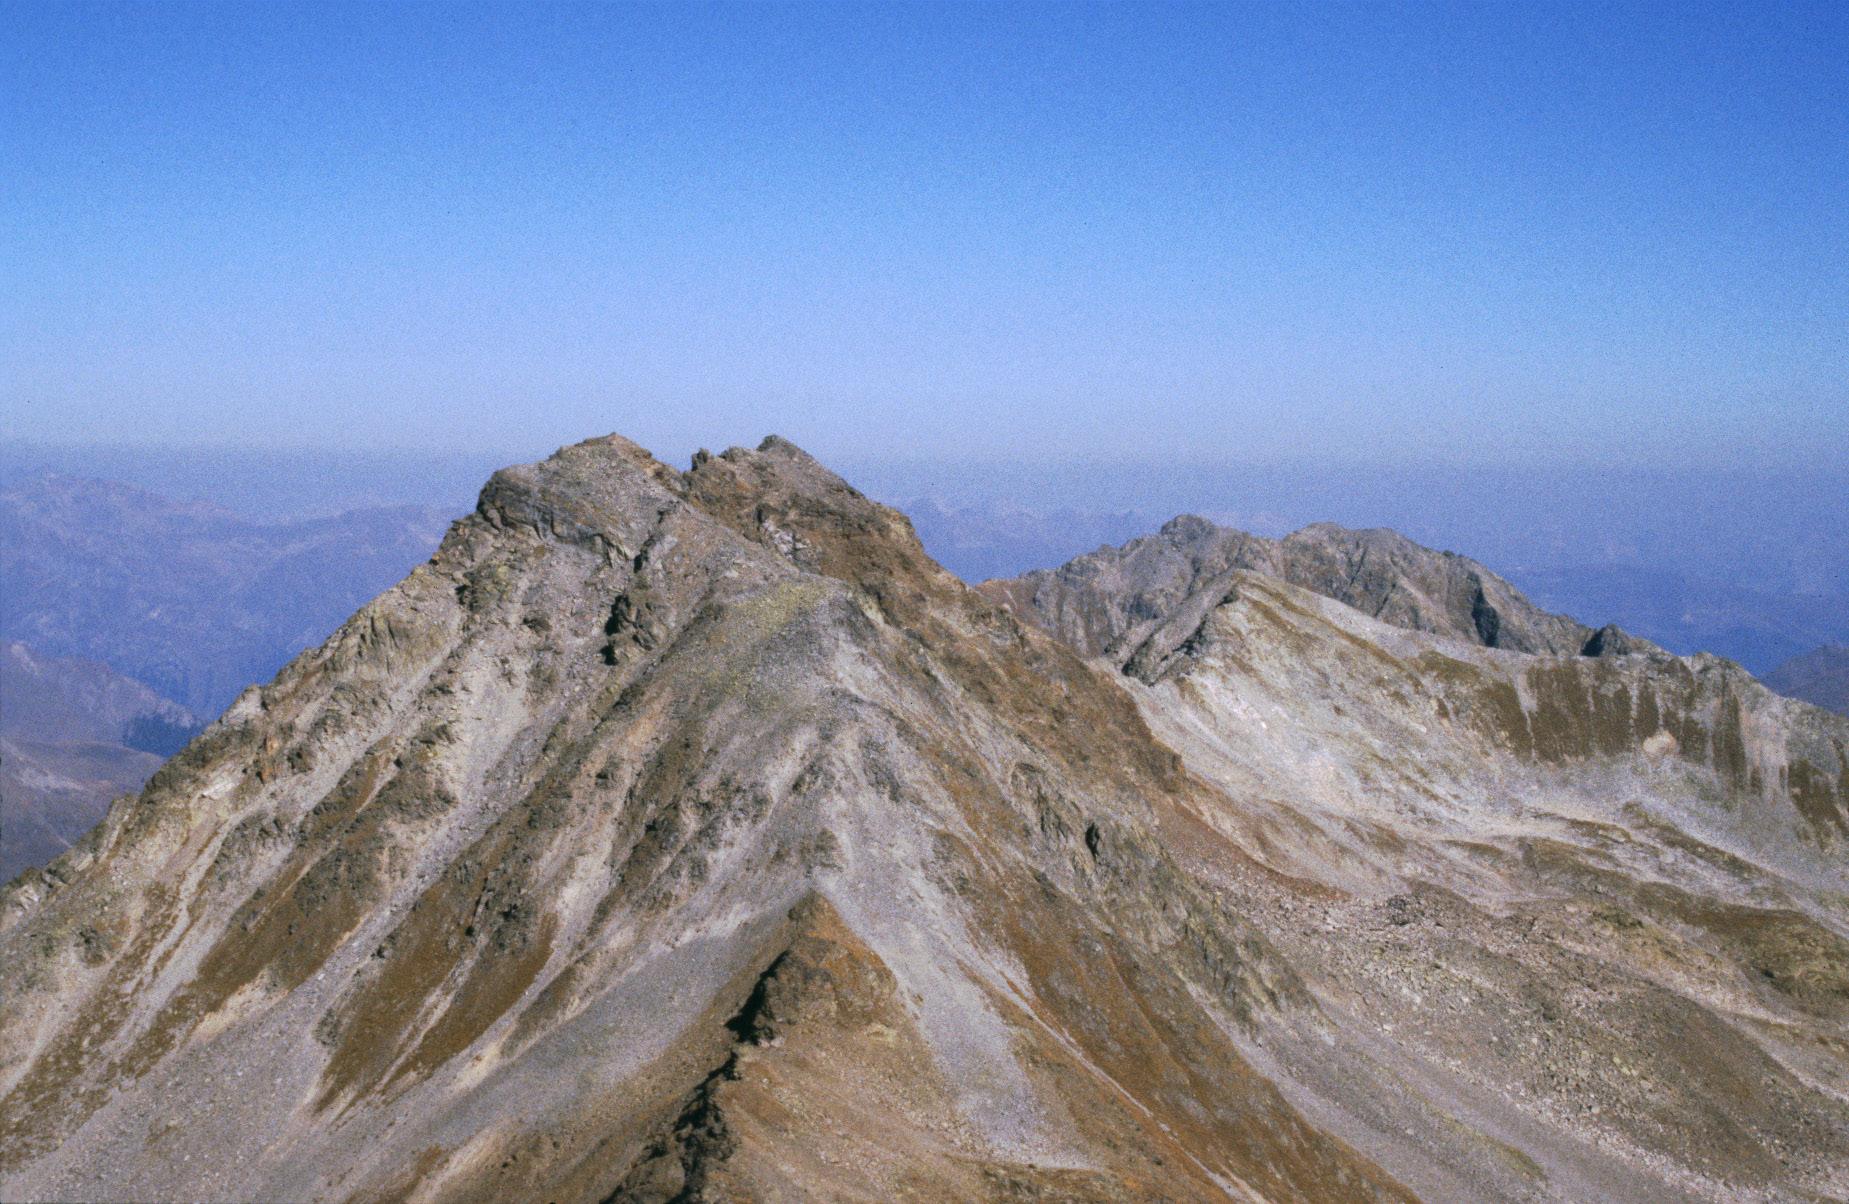 Klettersteig Nauders : Nauderer berge u2013 wikipedia